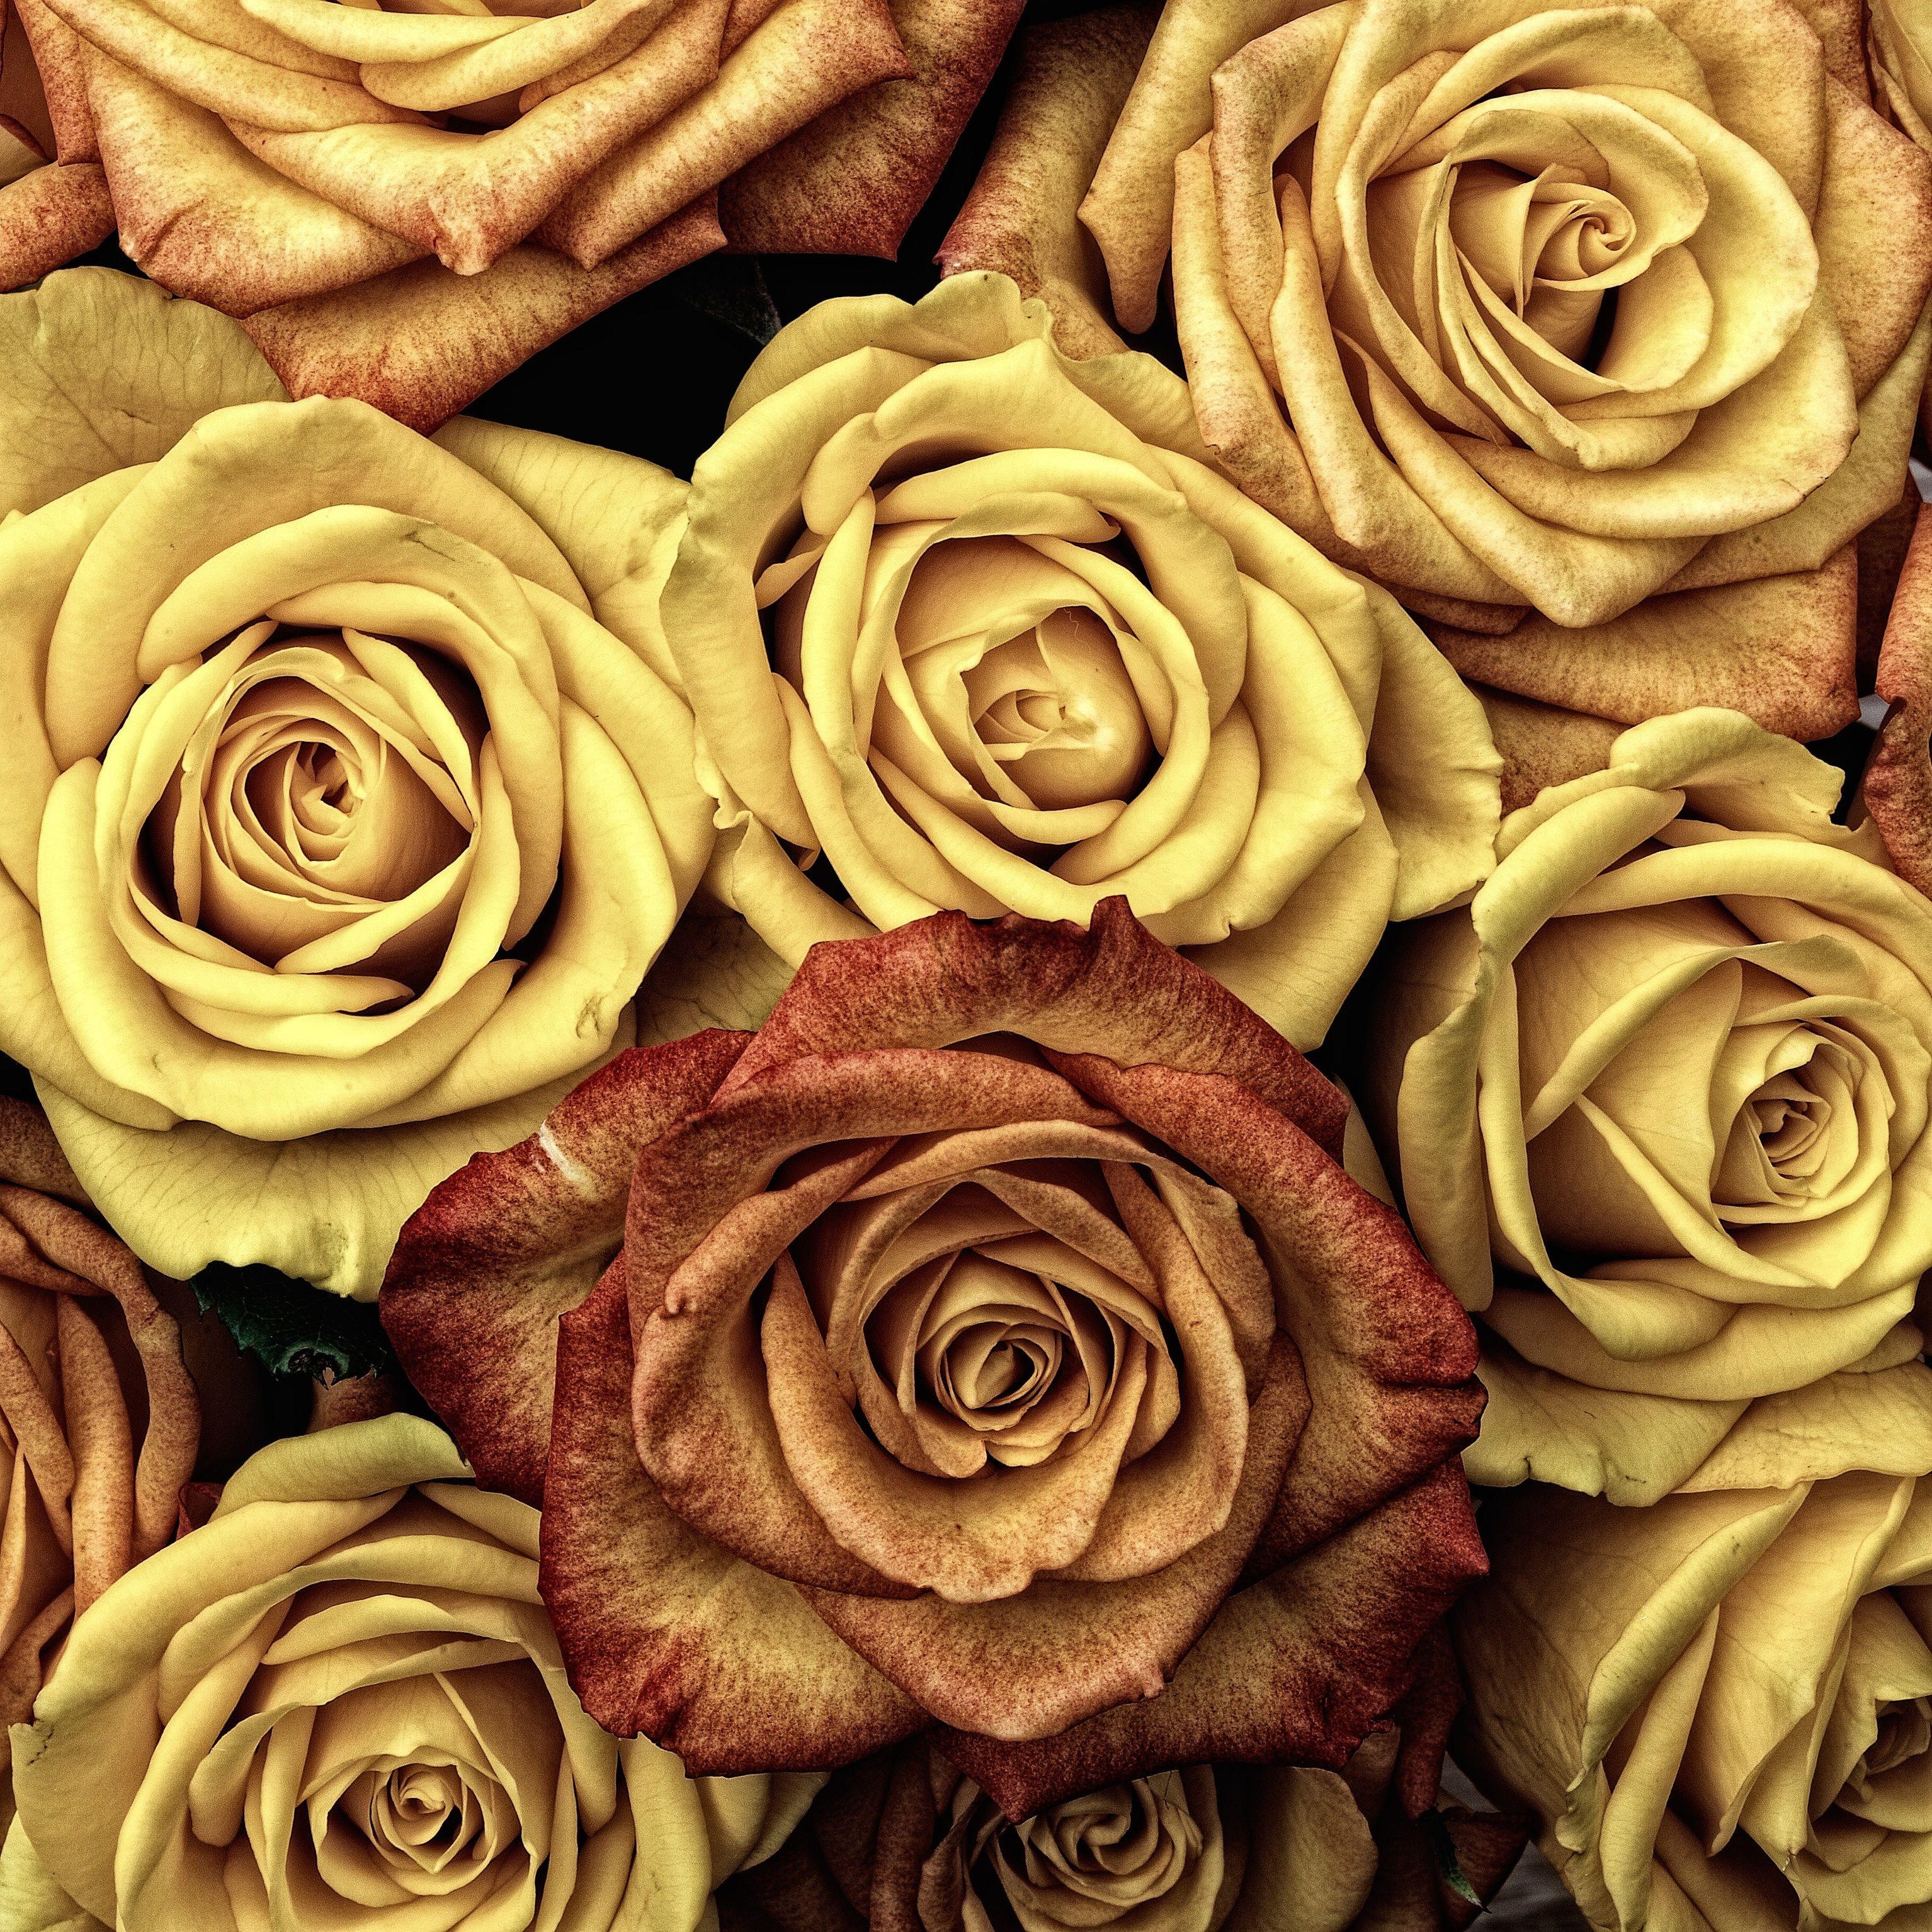 Photo by lobostudio hamburg unsplash unsplash beauty pinterest explore rose flowers french flowers and more mightylinksfo